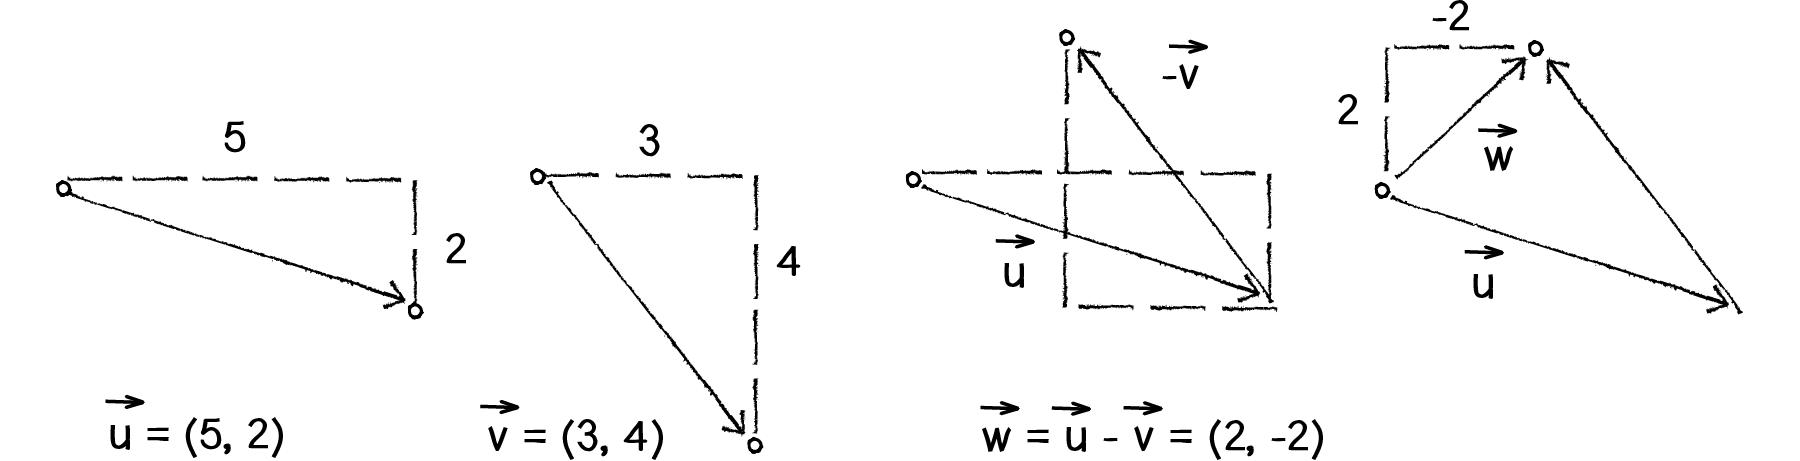 Add Matrix & Vector Modes